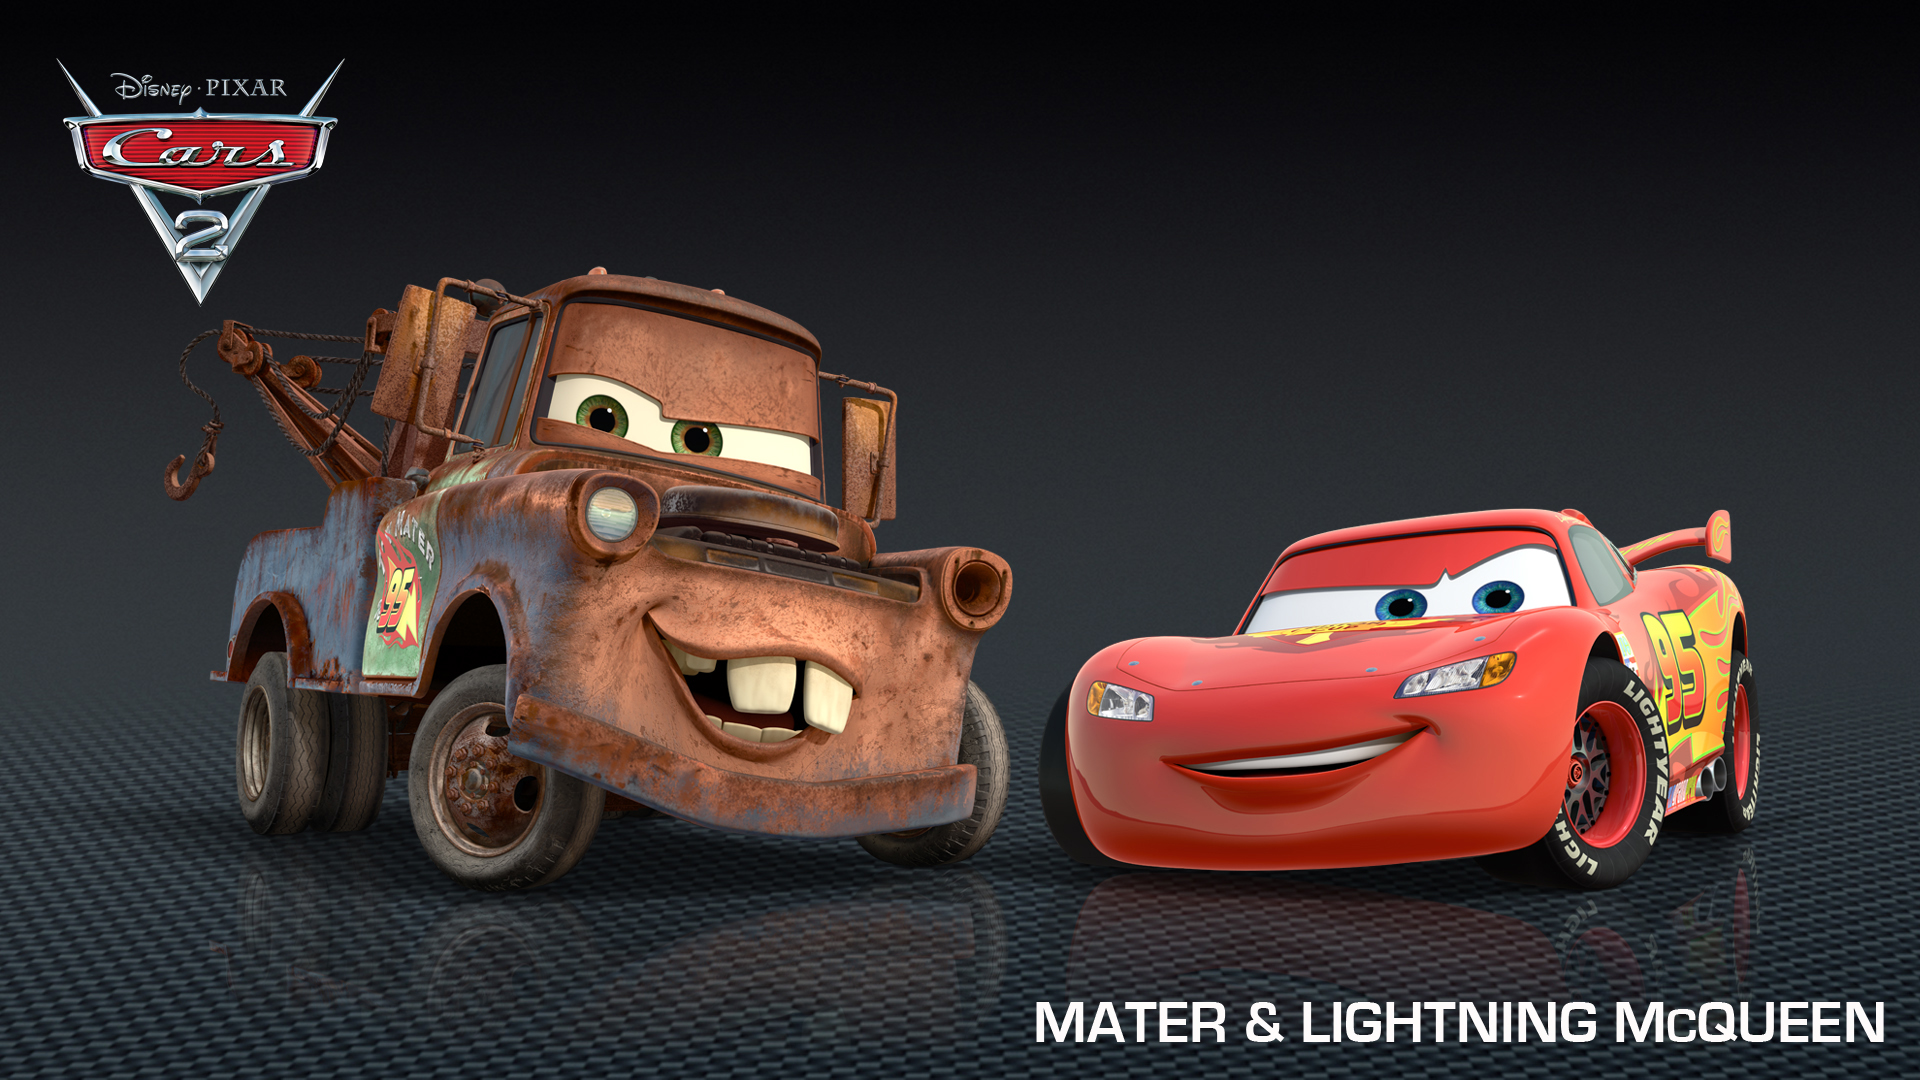 More Cars 2 Character Images, Descriptions, Video